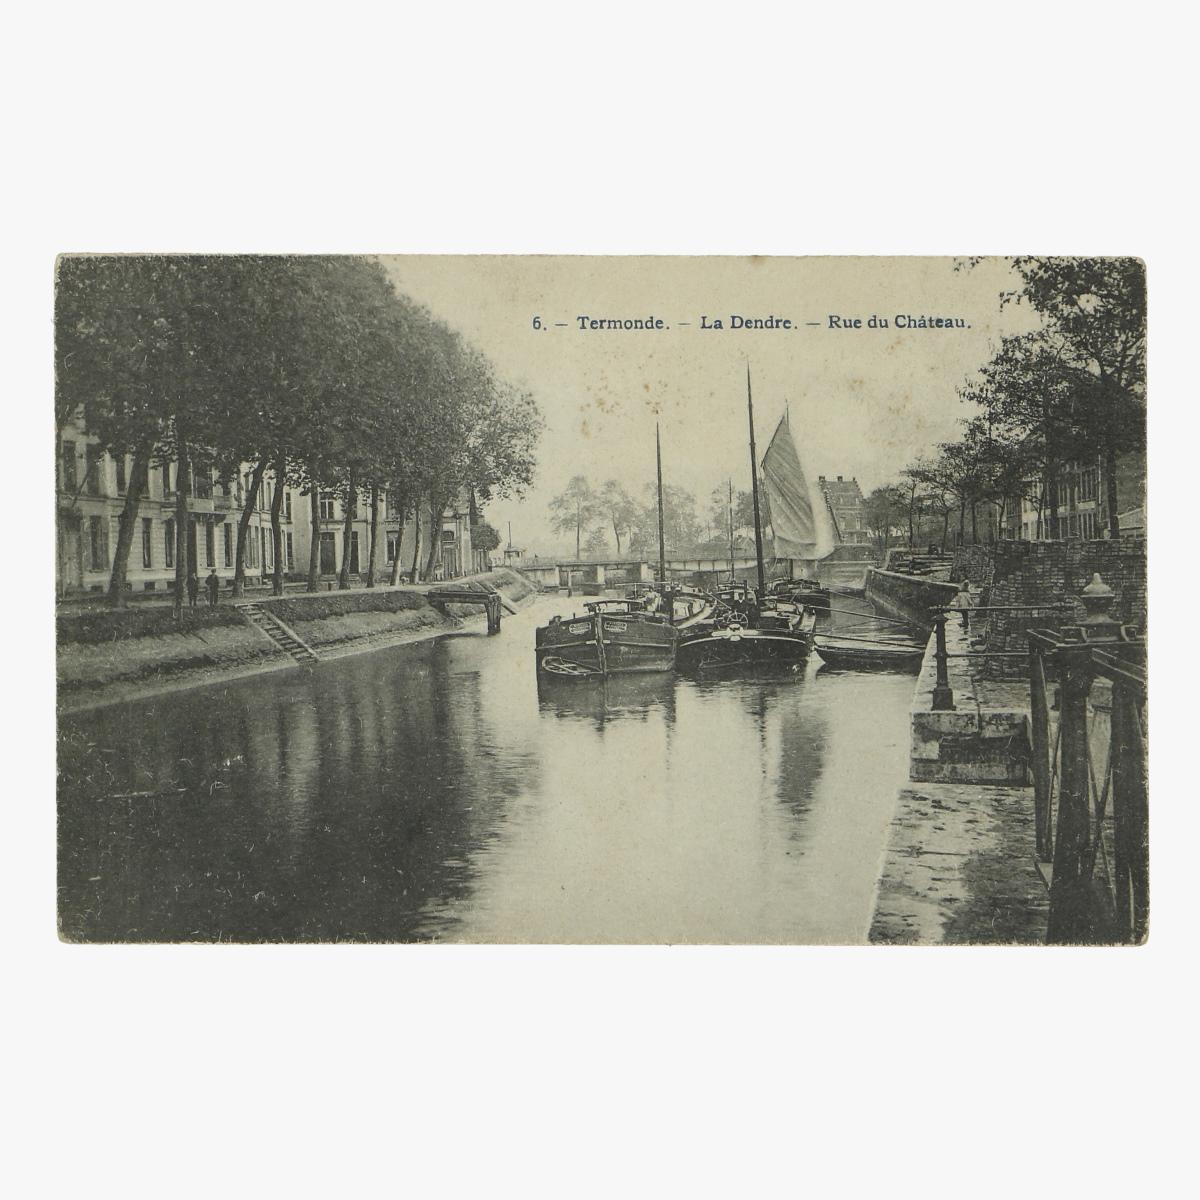 Afbeeldingen van oude postkaart Termonde.-La Dendre.-Rue du Chateau